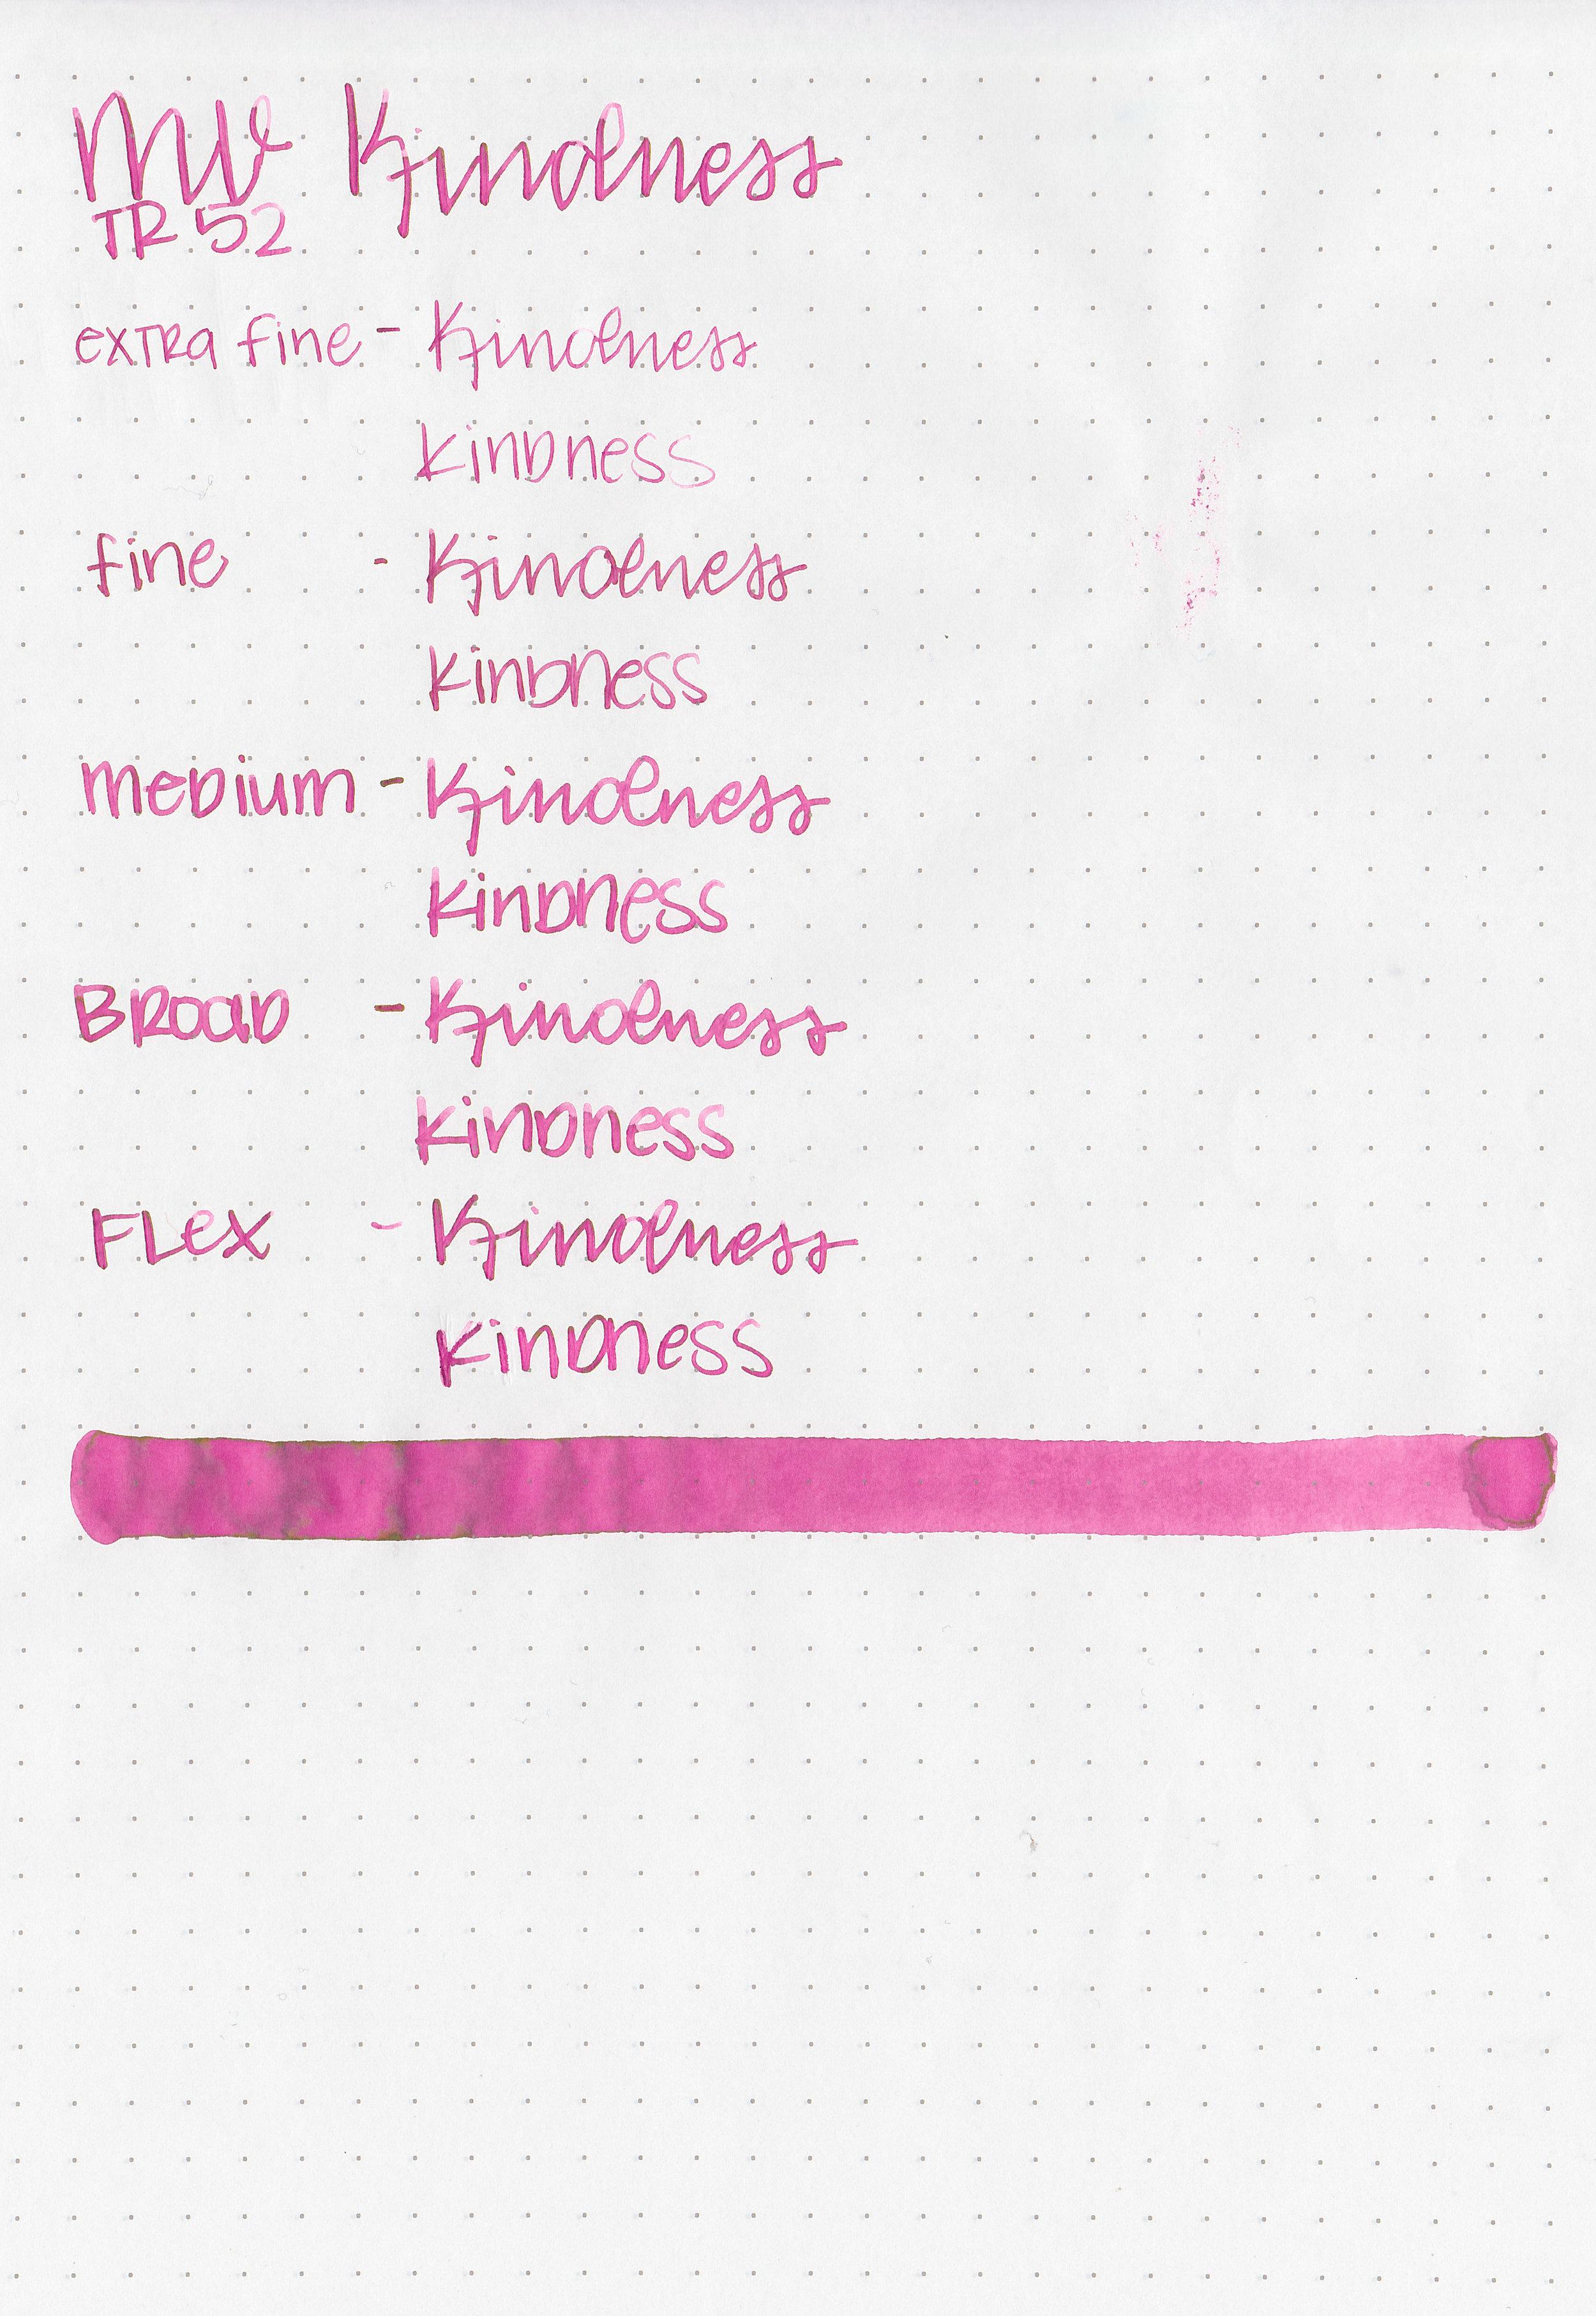 mv-kindness-5.jpg